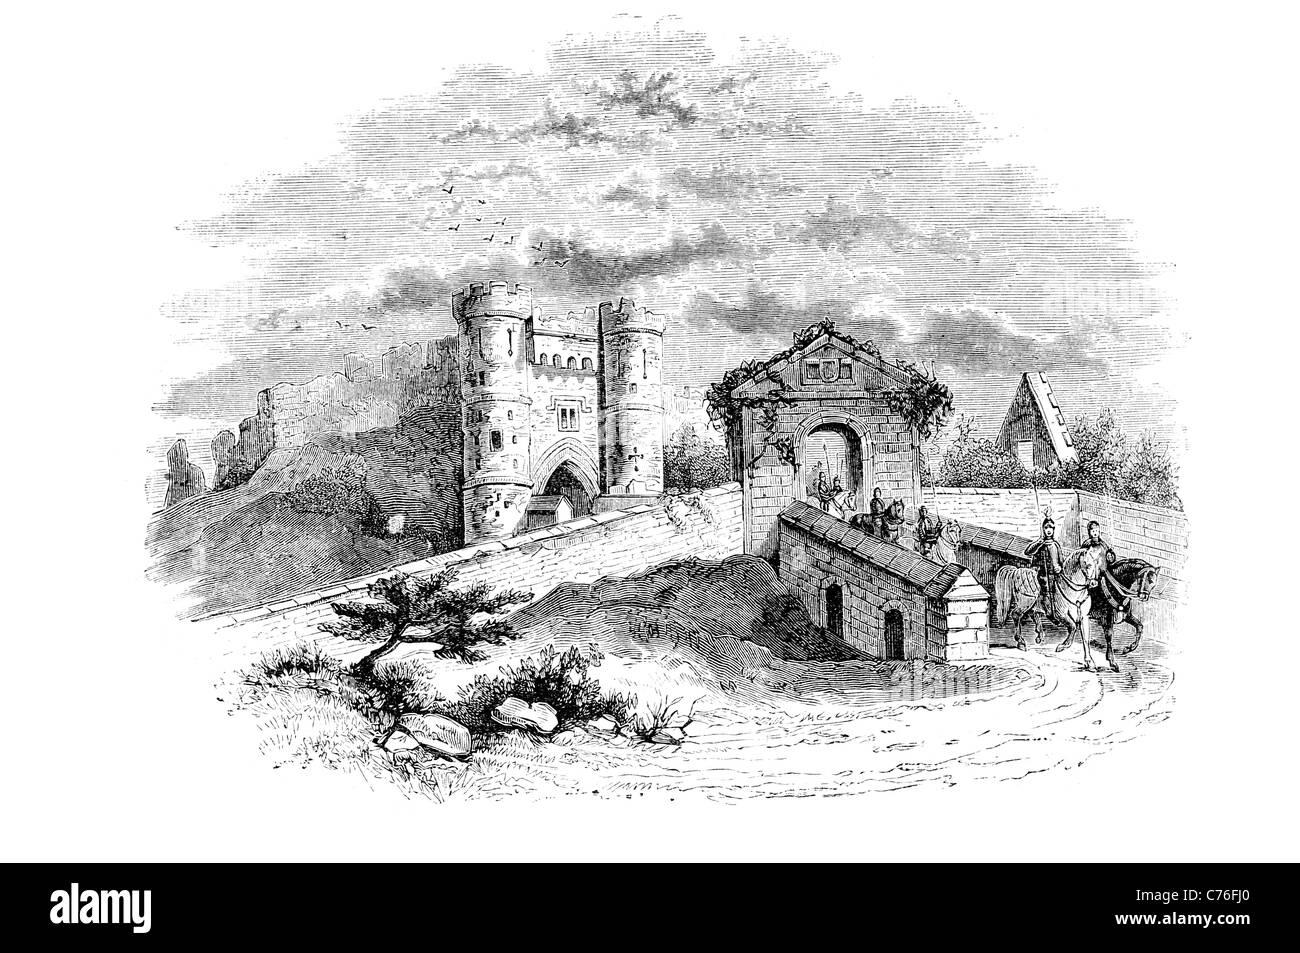 Carisbrooke Castle motte and bailey castle chateau stronghold citadel fastness donjon bastion turret fort battle Stock Photo